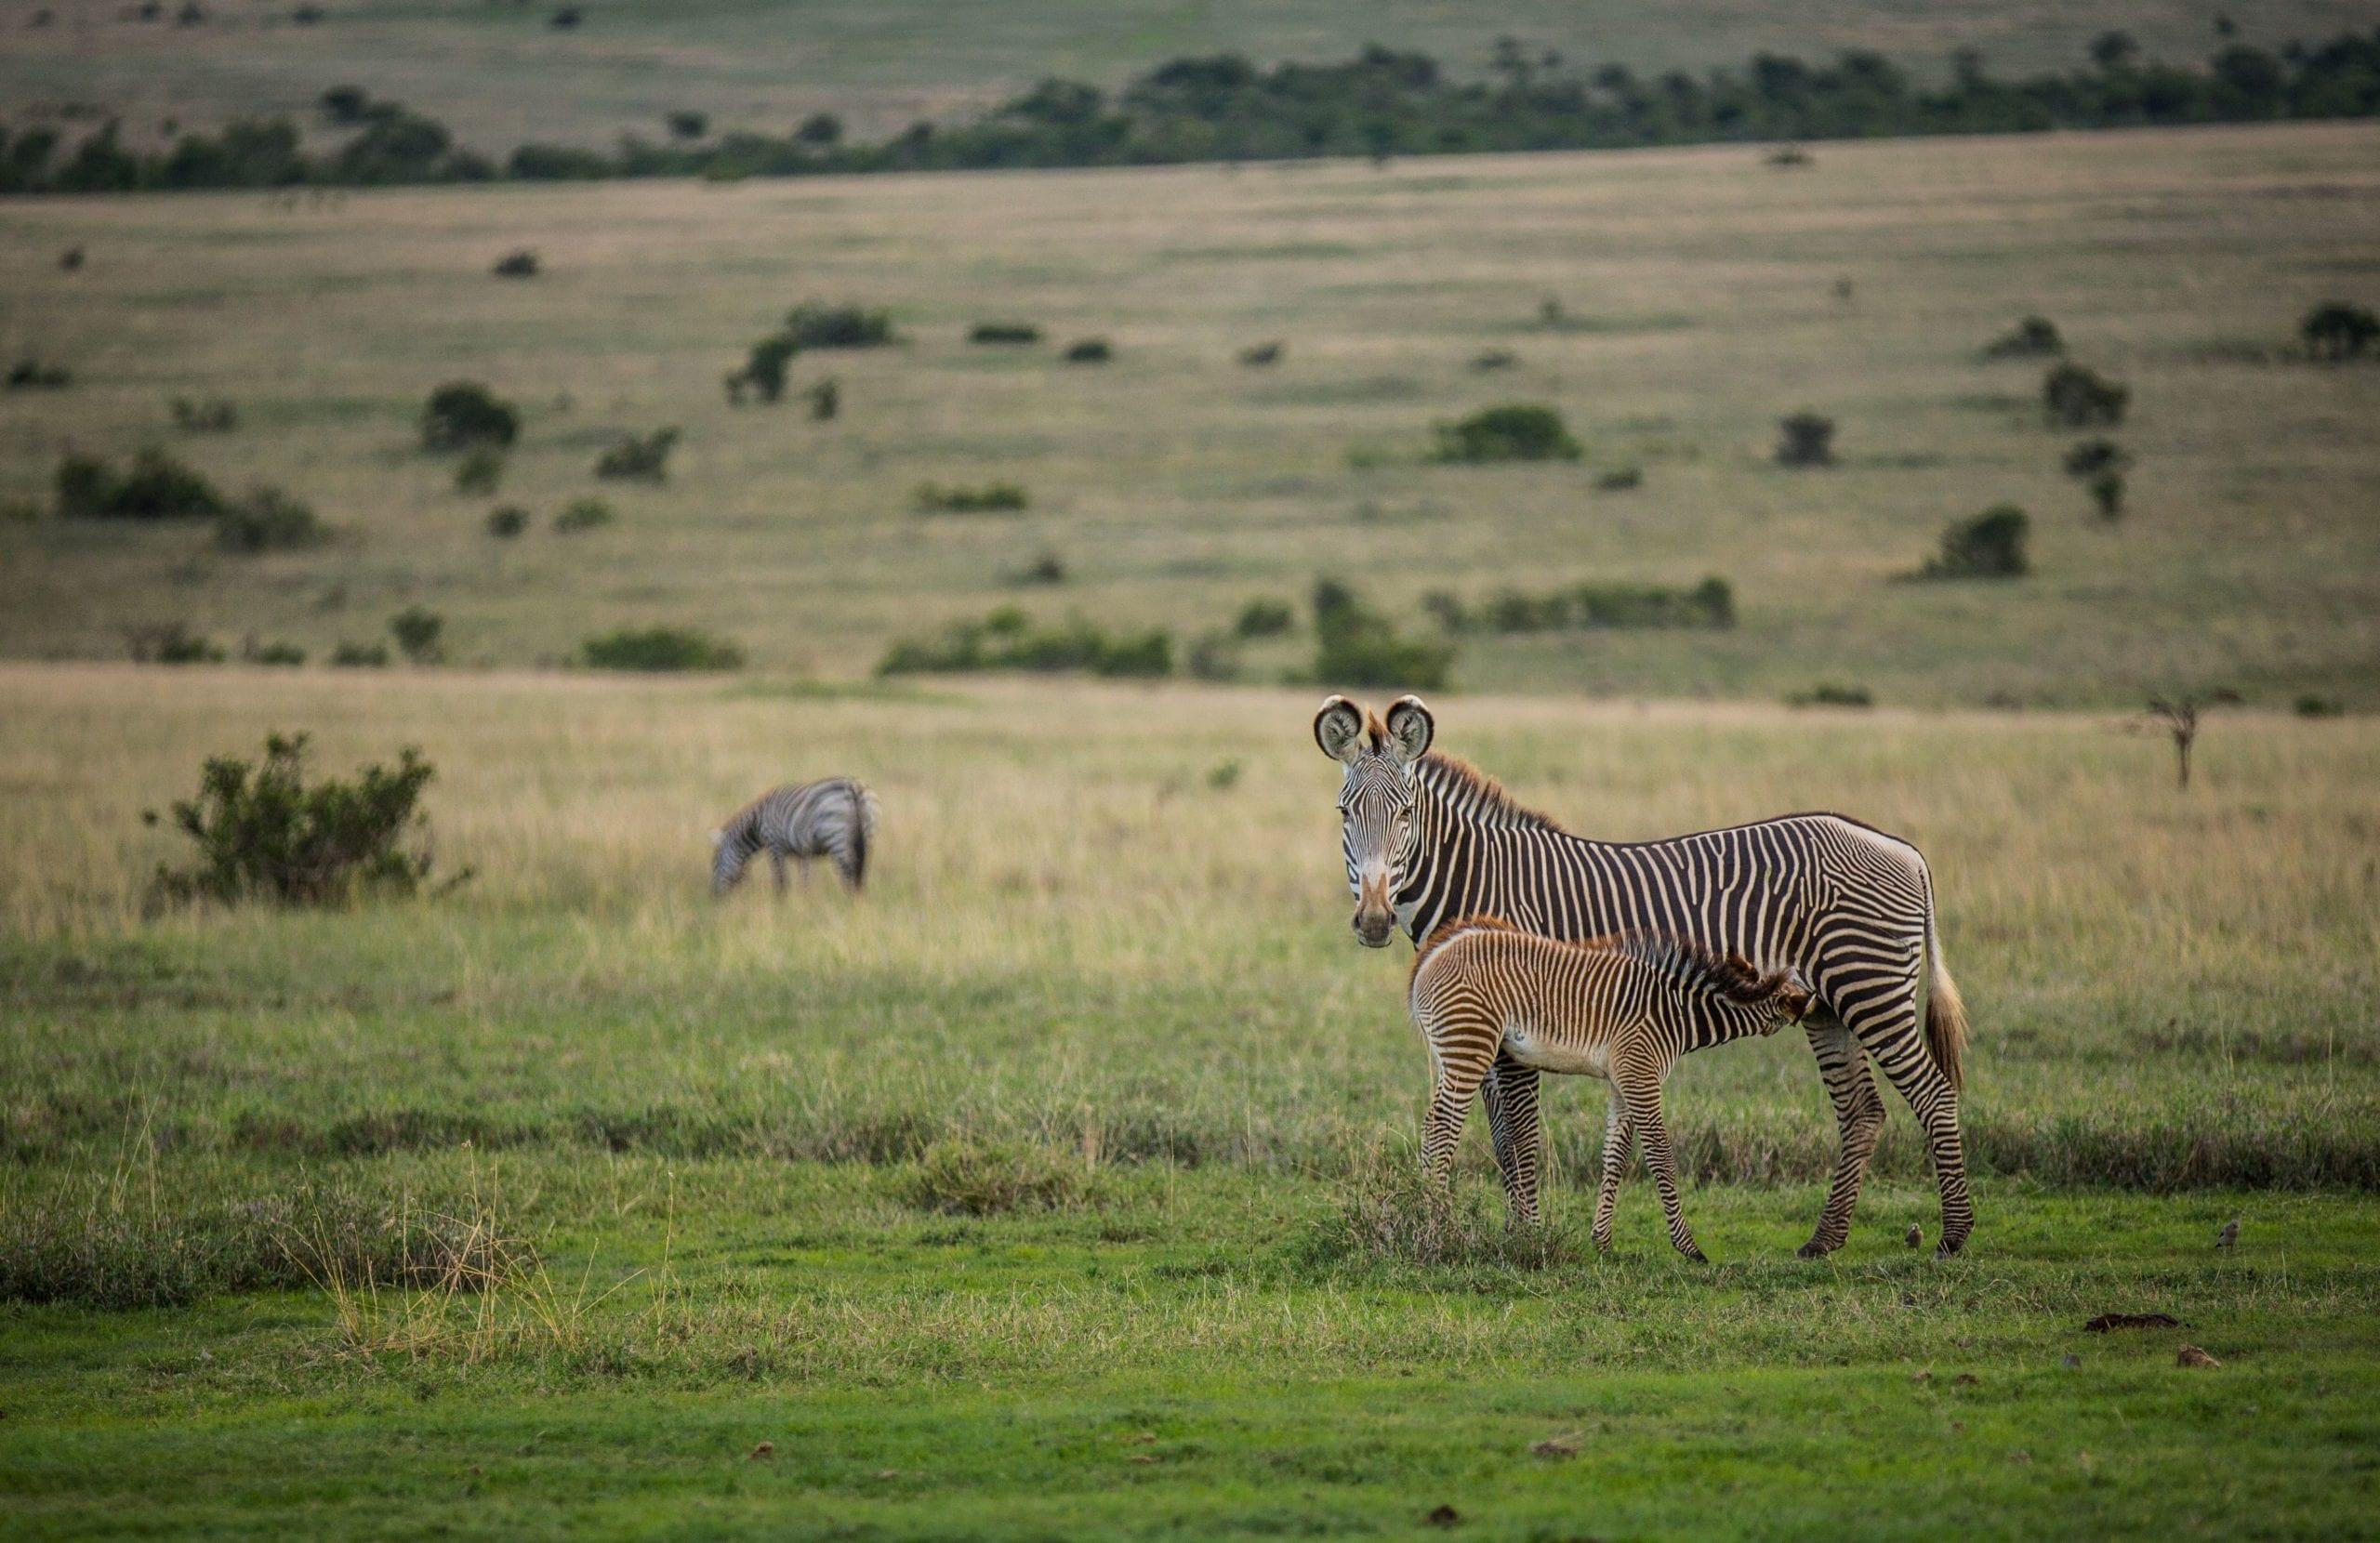 Wildlife Zebra Encounters Mount Kenya Africa